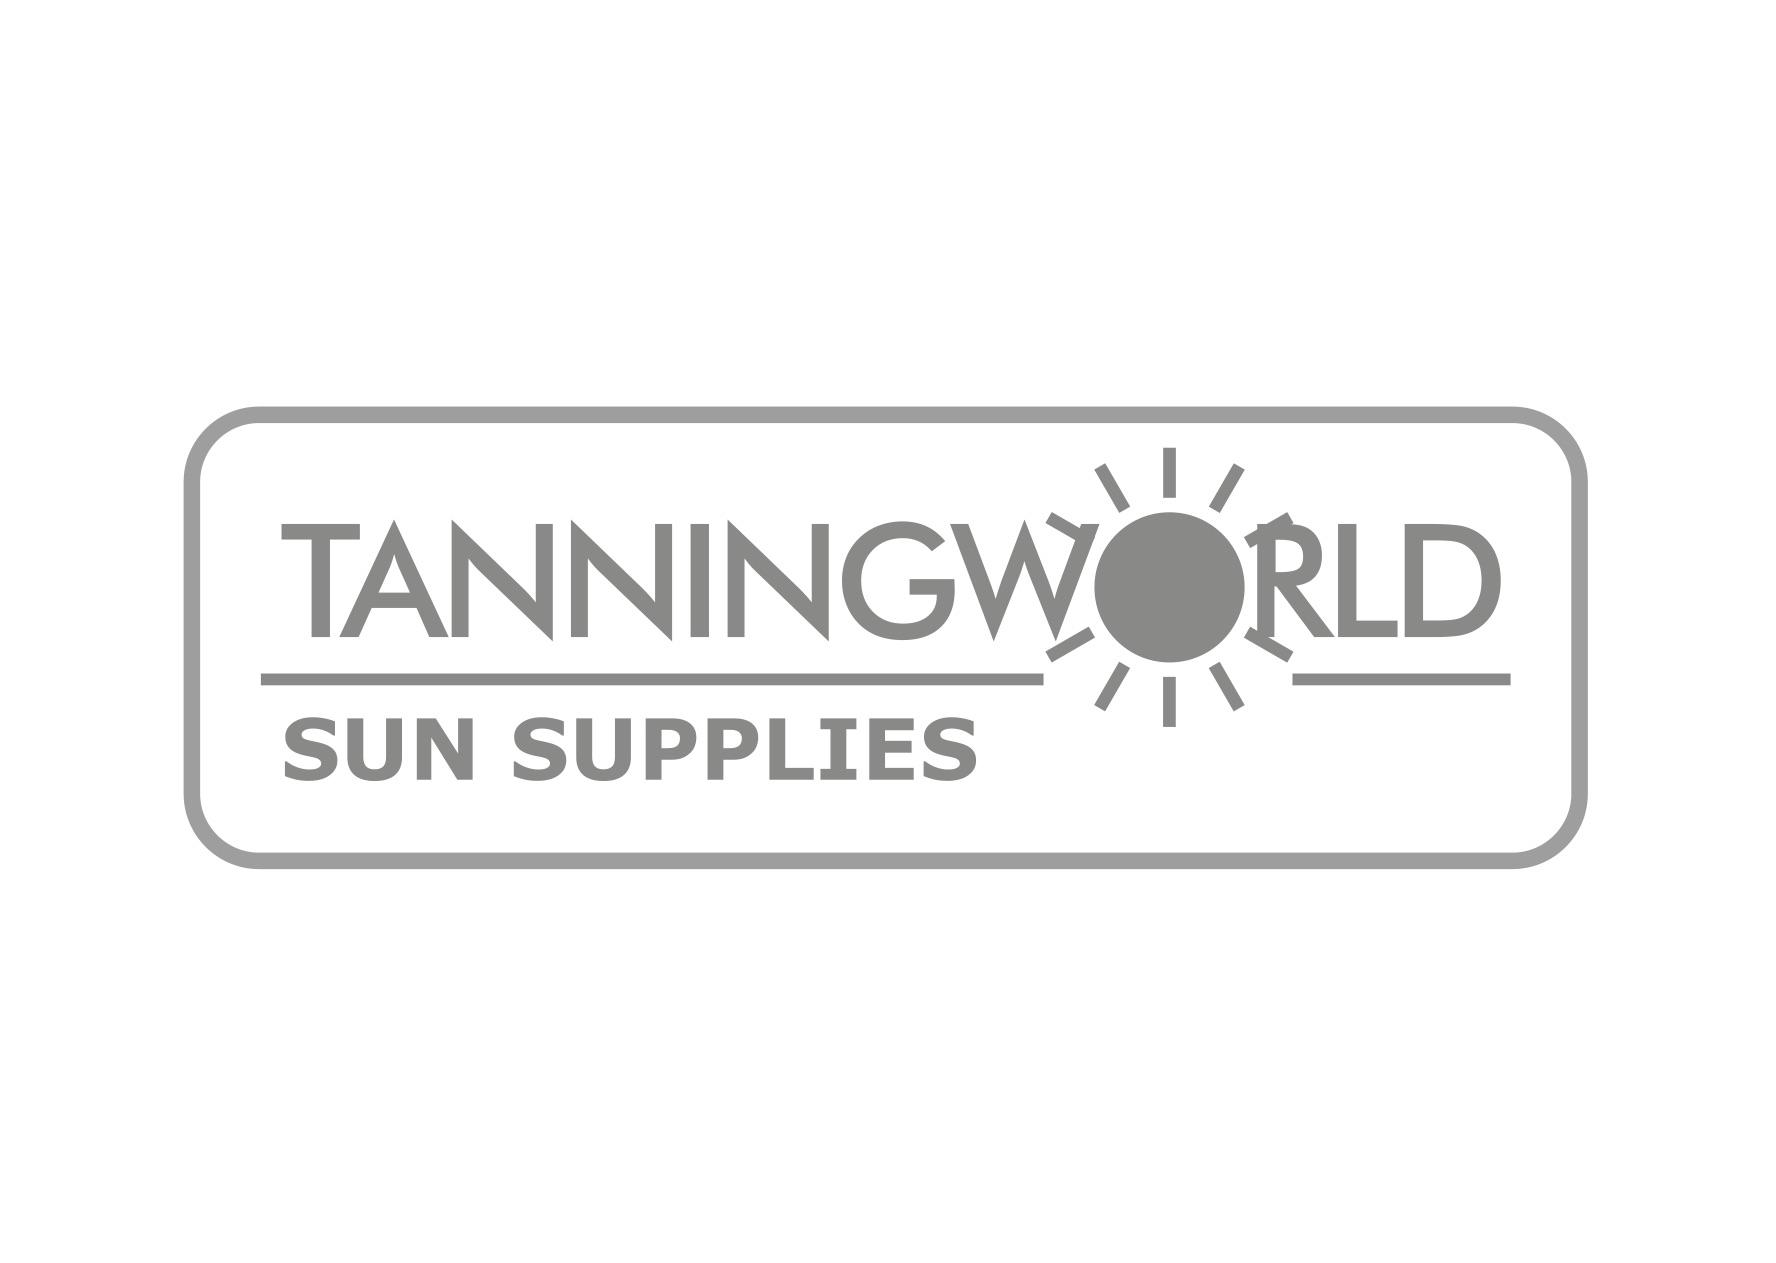 Tanningworld Sun Supplies